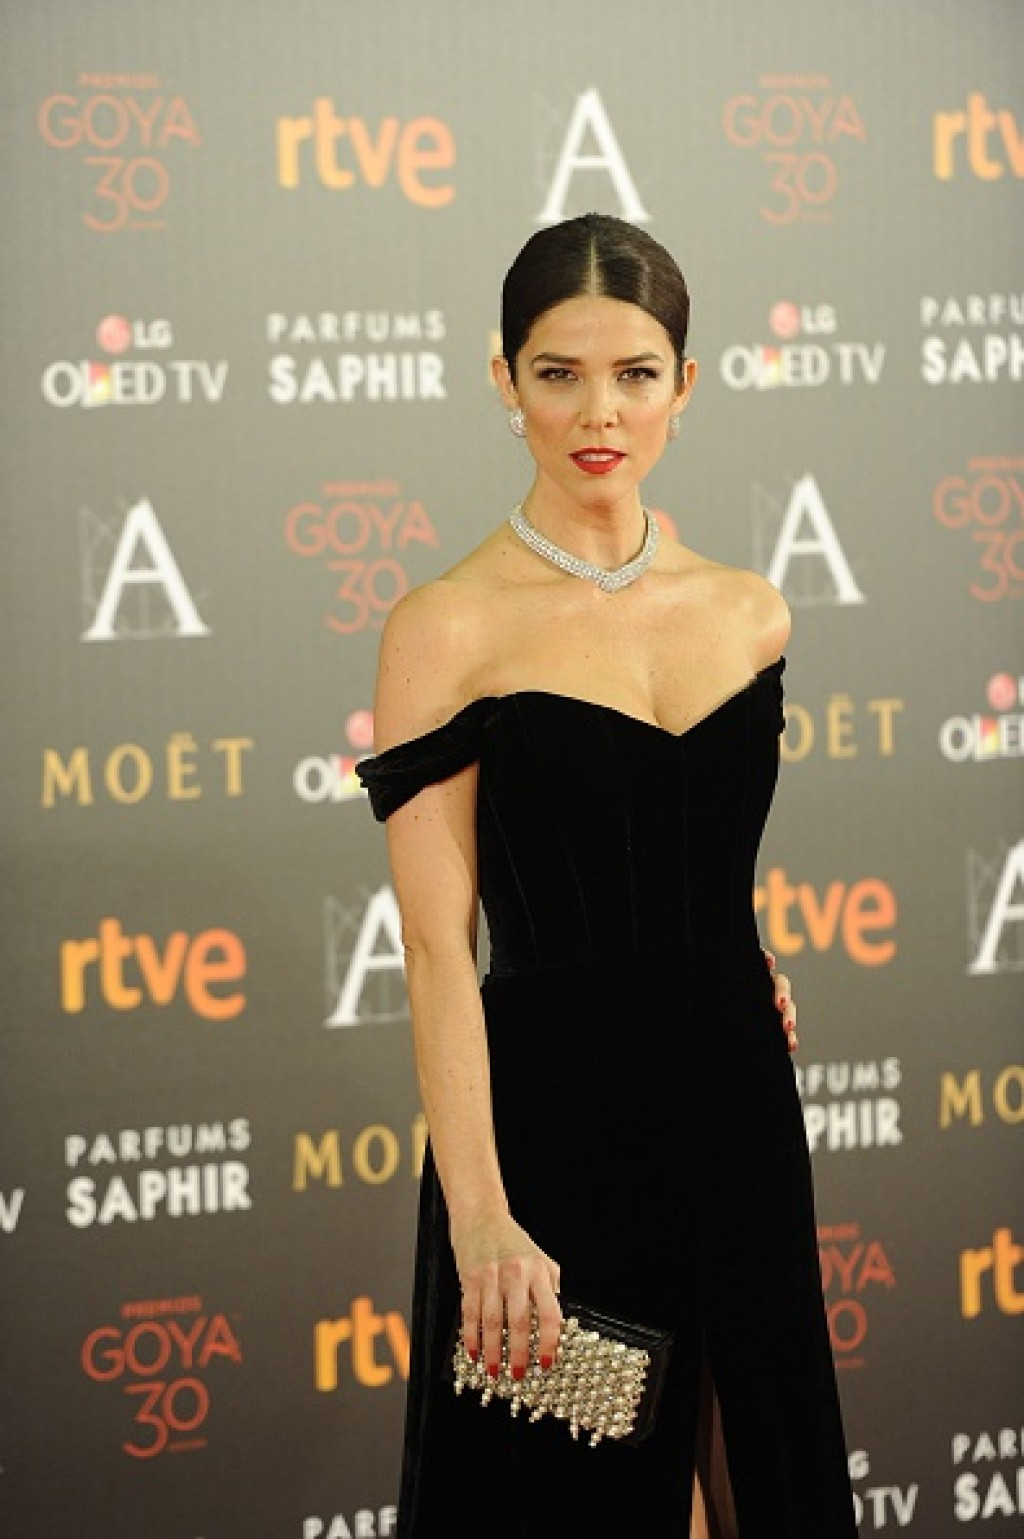 Goya-Cinema-Awards-2016-Juana-Acosta-Gown-half-1024x1539